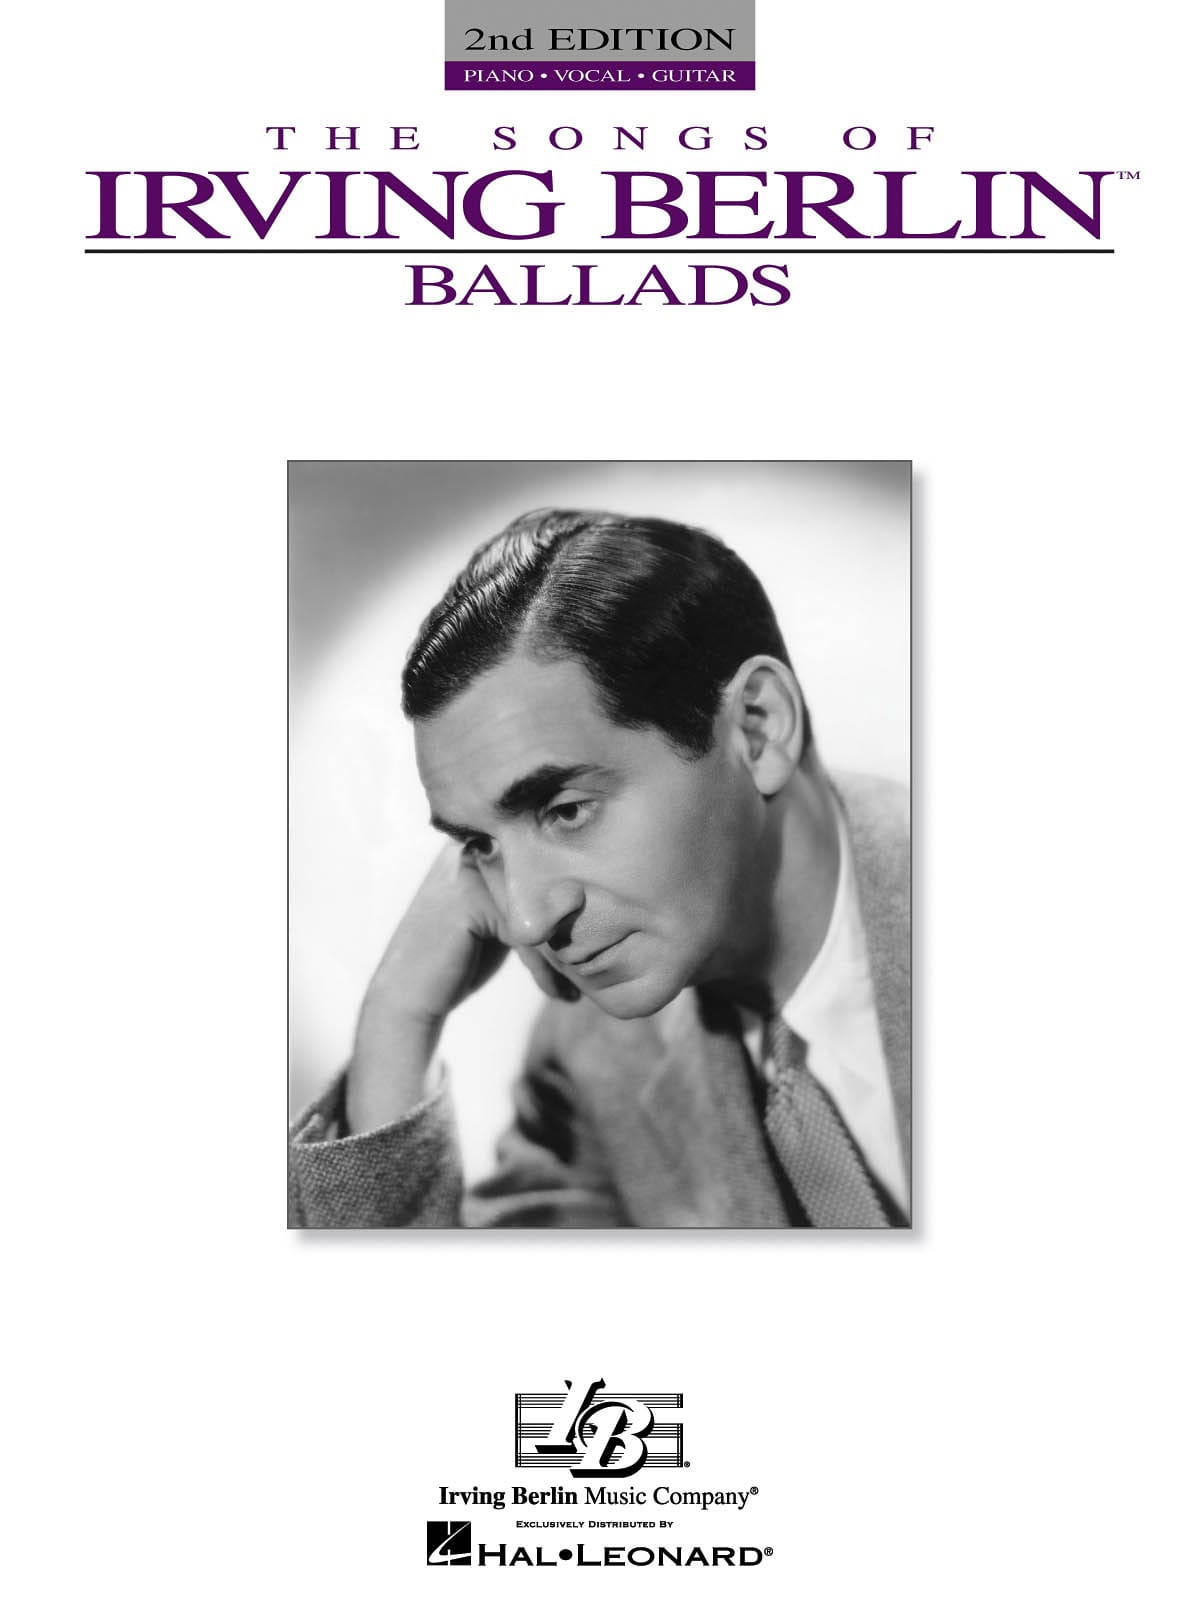 Ballads - 2nd Edition - Irving Berlin - Partition - laflutedepan.com